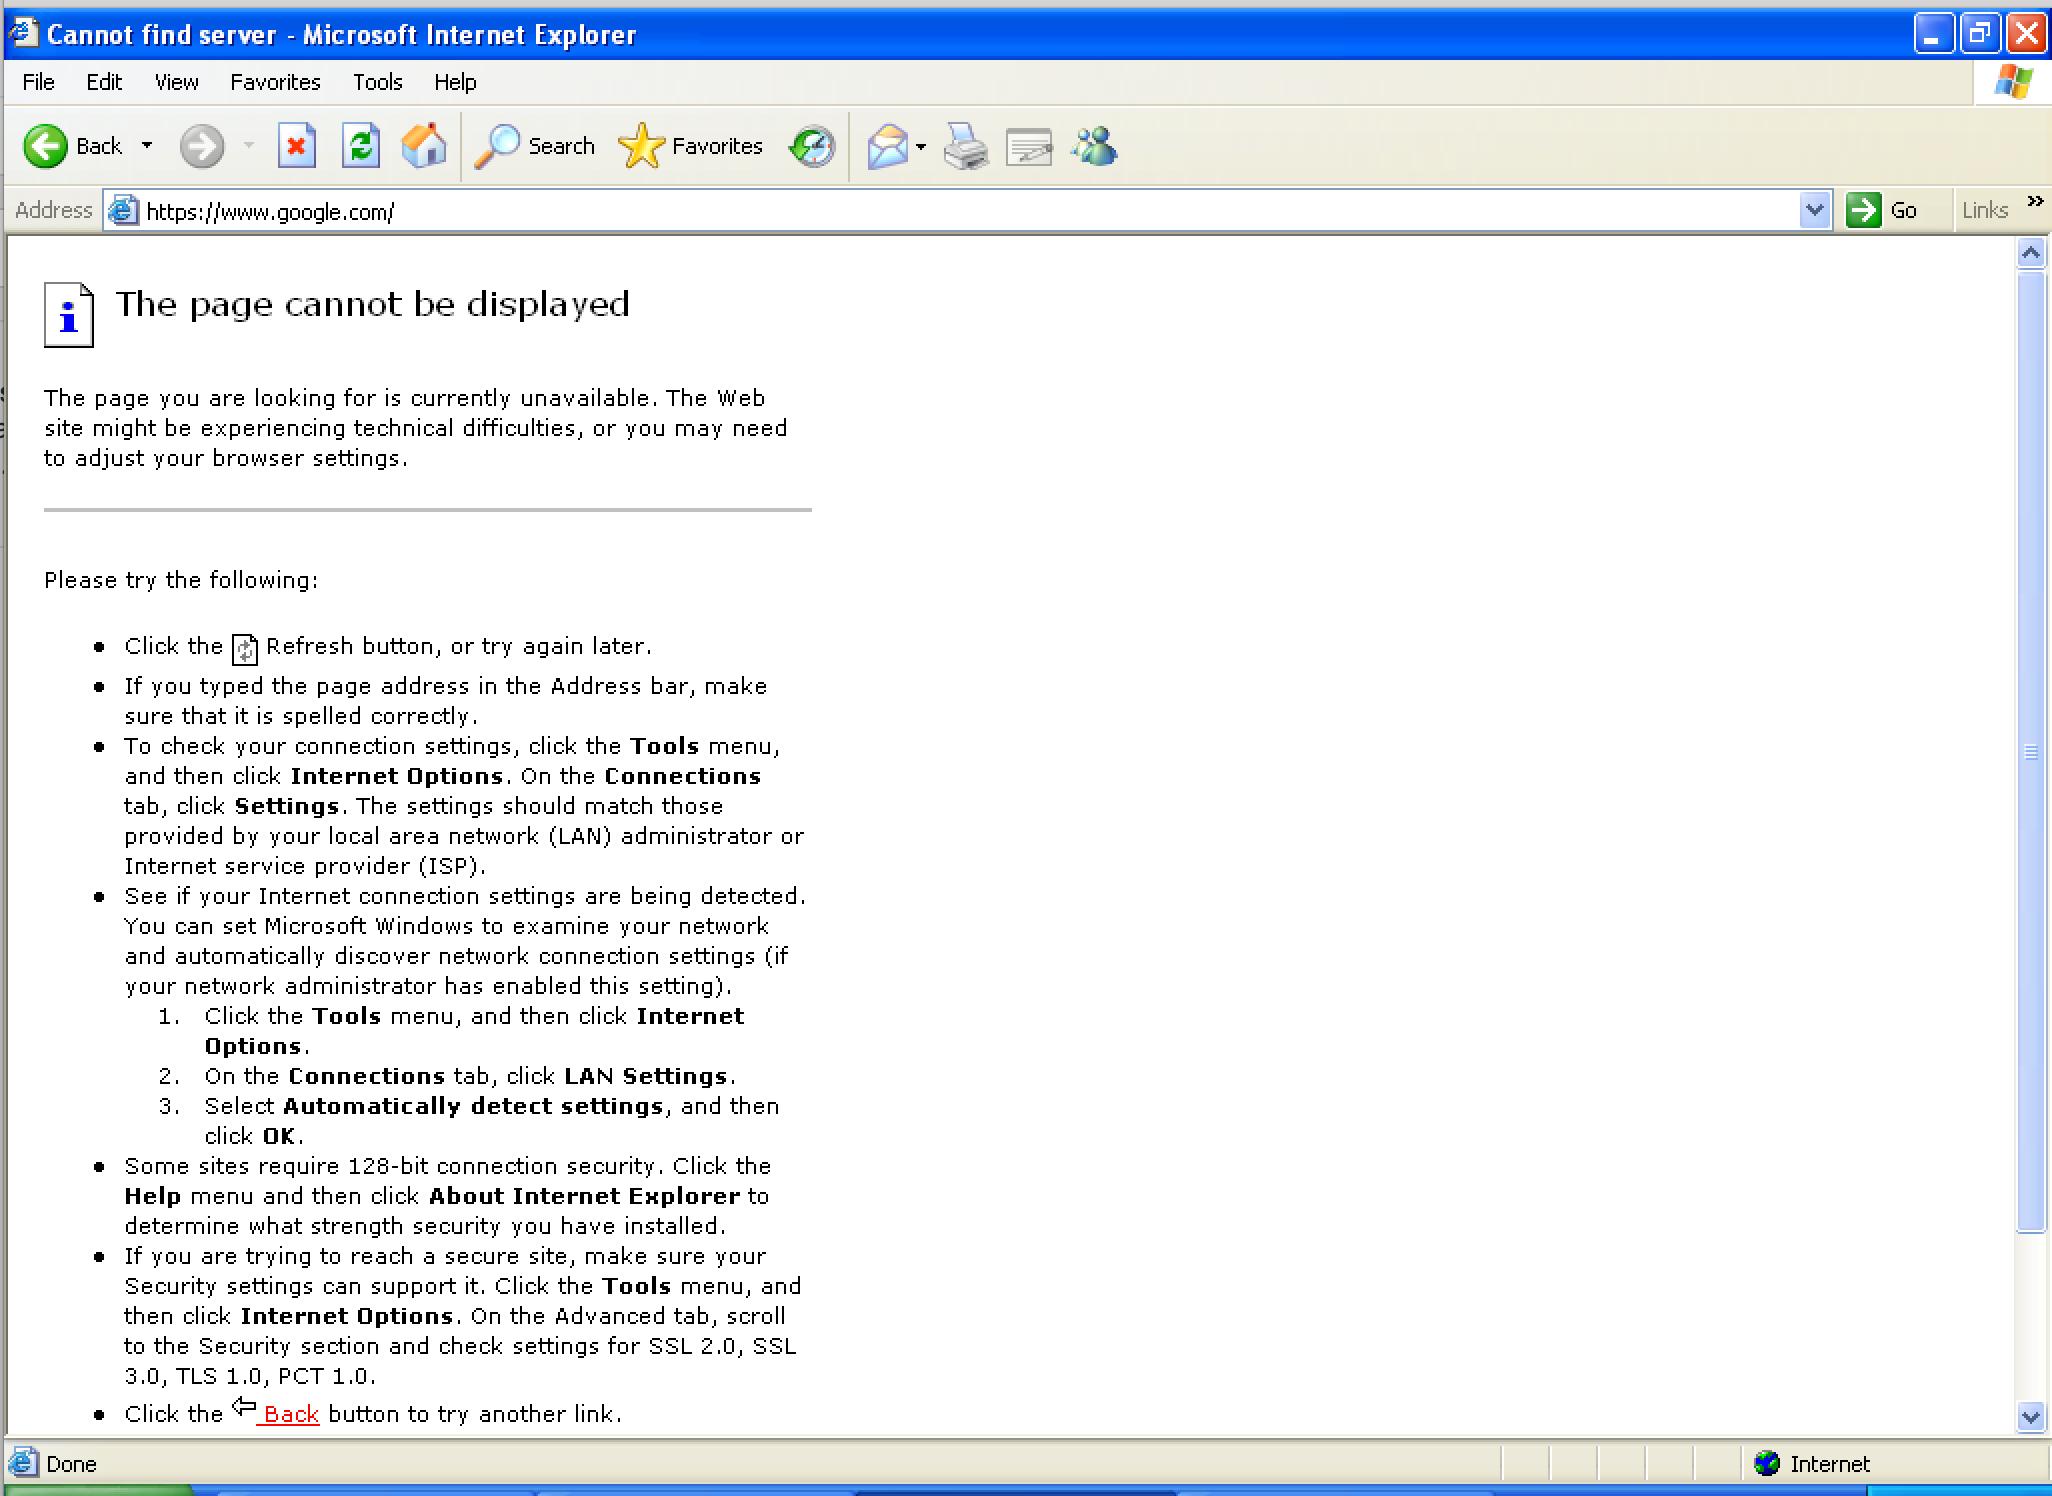 Error page for SHA-1 failure